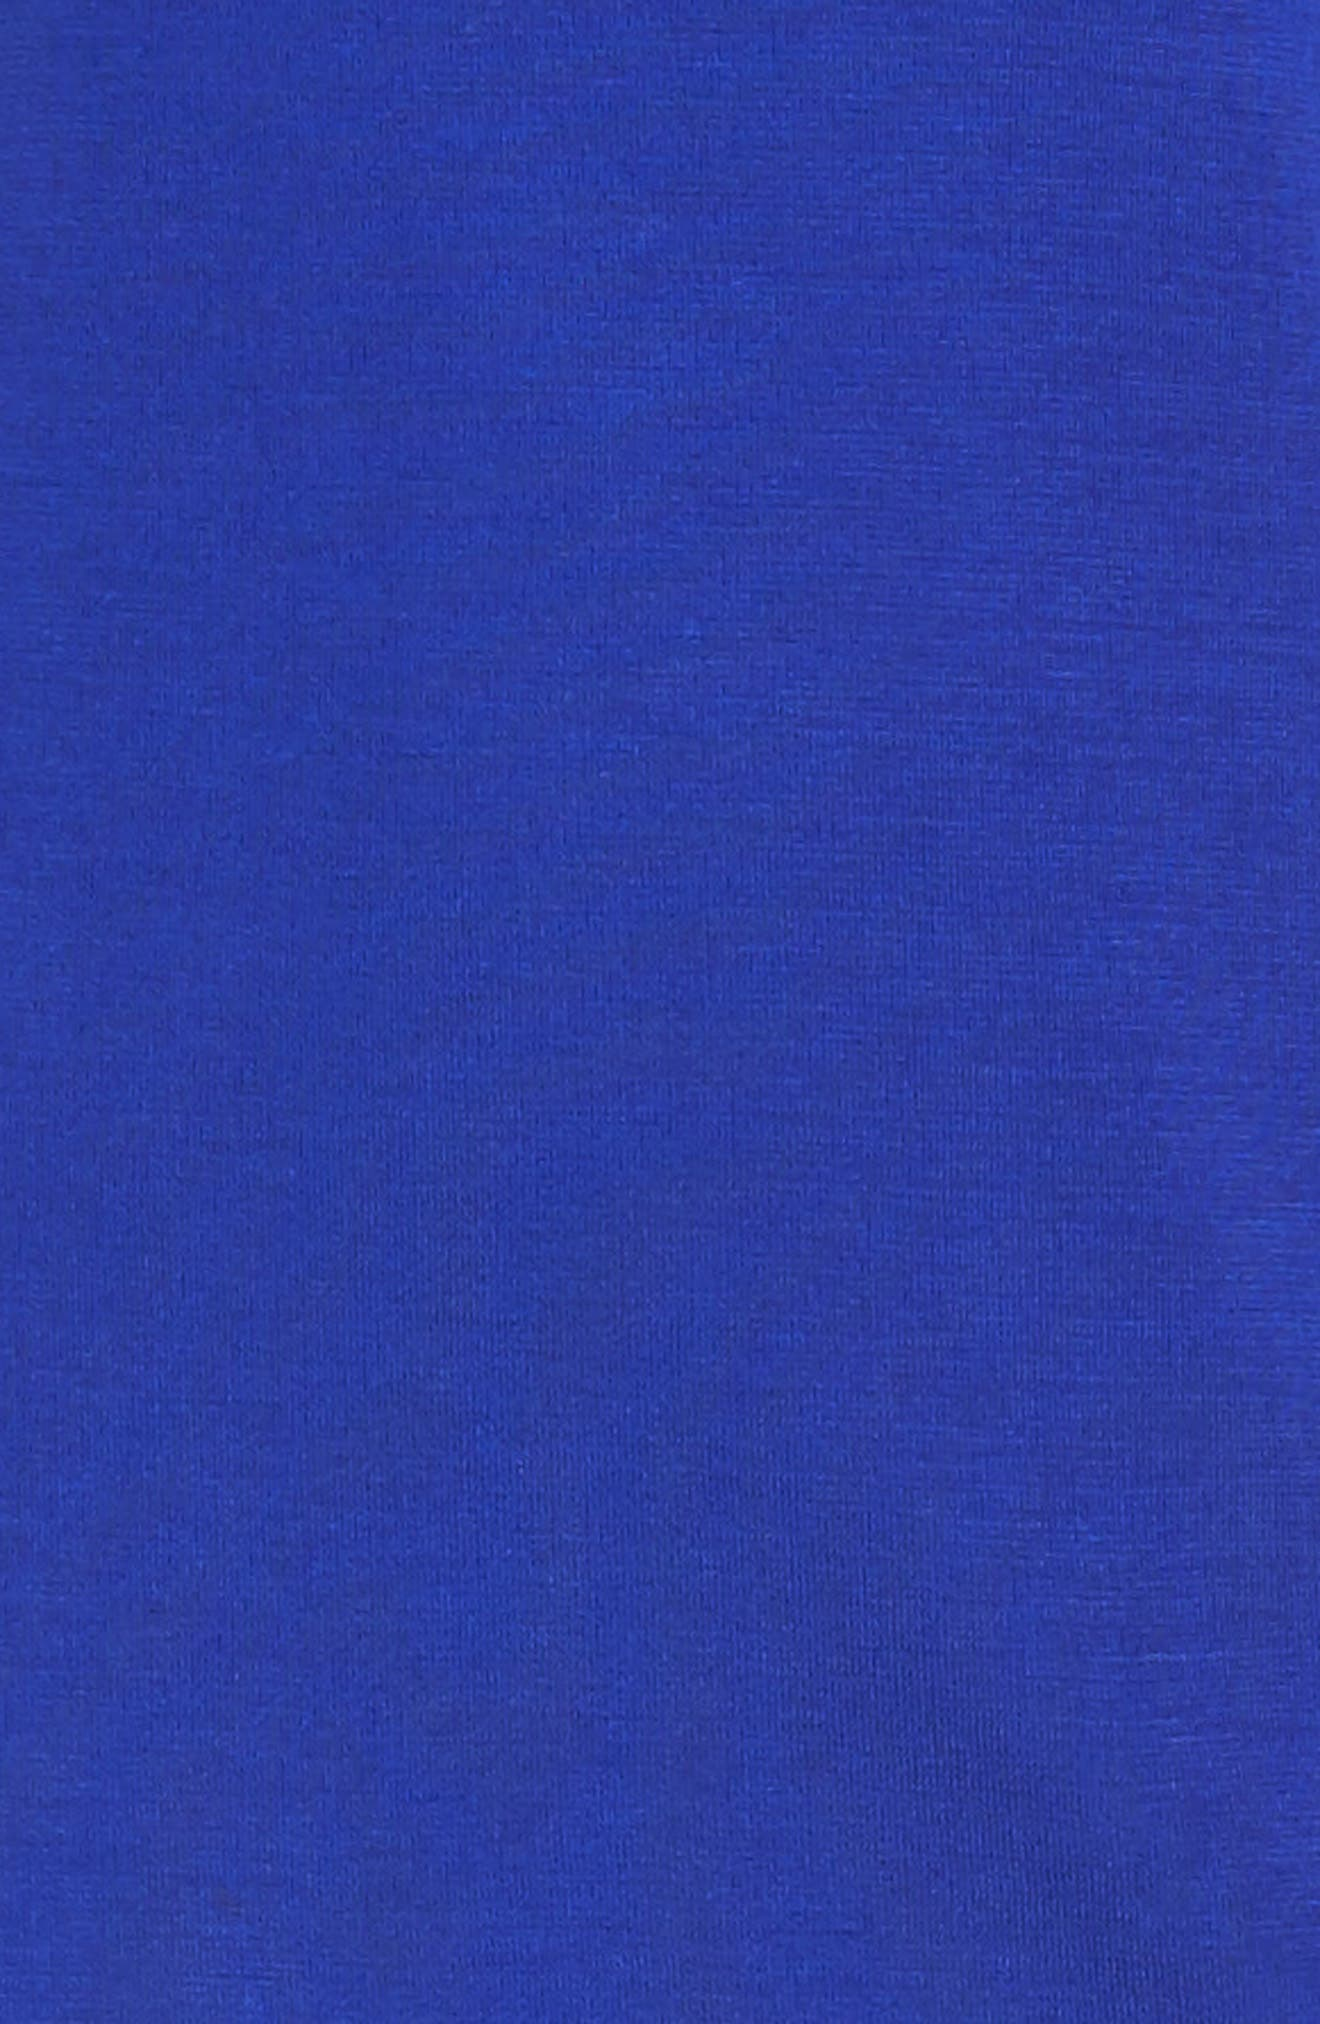 Knit Sheath Dress,                             Alternate thumbnail 6, color,                             Blue Flame